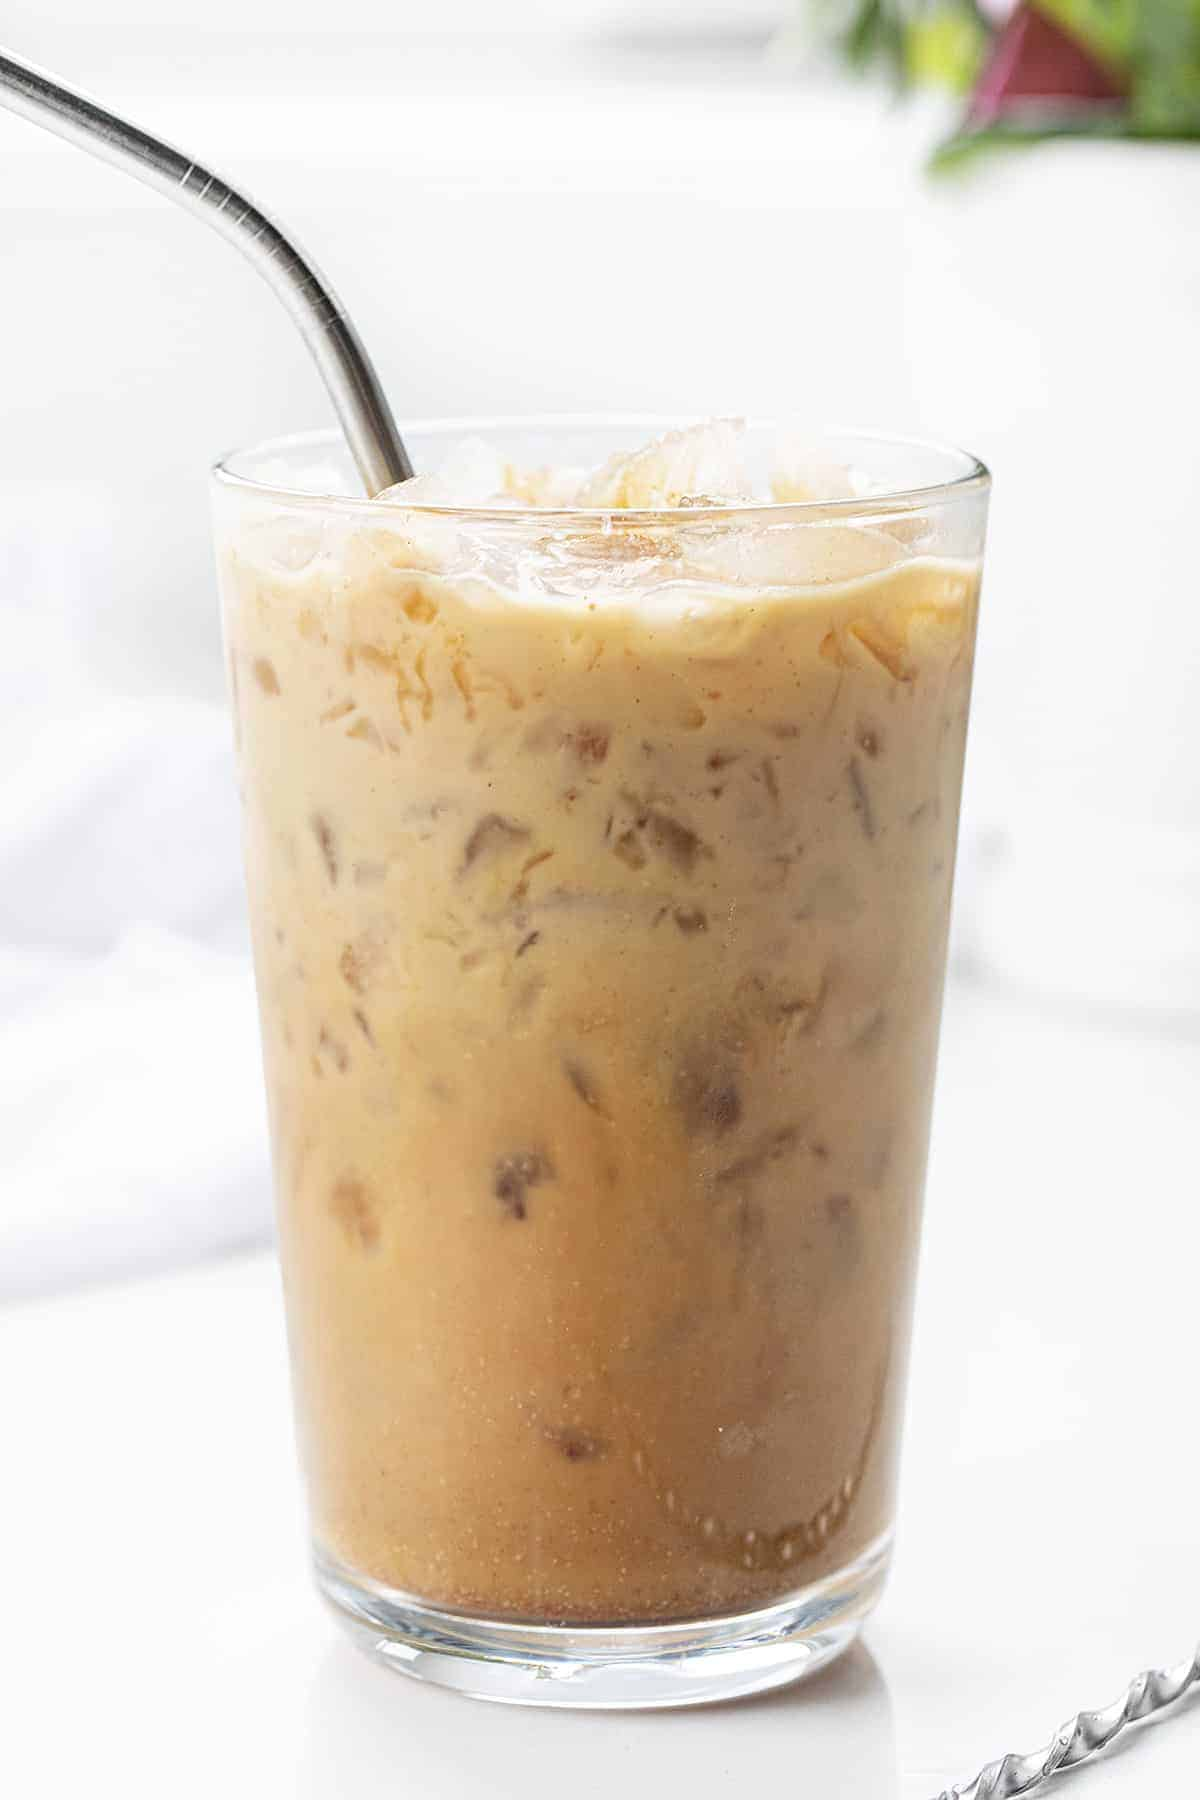 Copycat Starbucks Iced Brown Sugar Oat Milk Espresso Drink with Straw